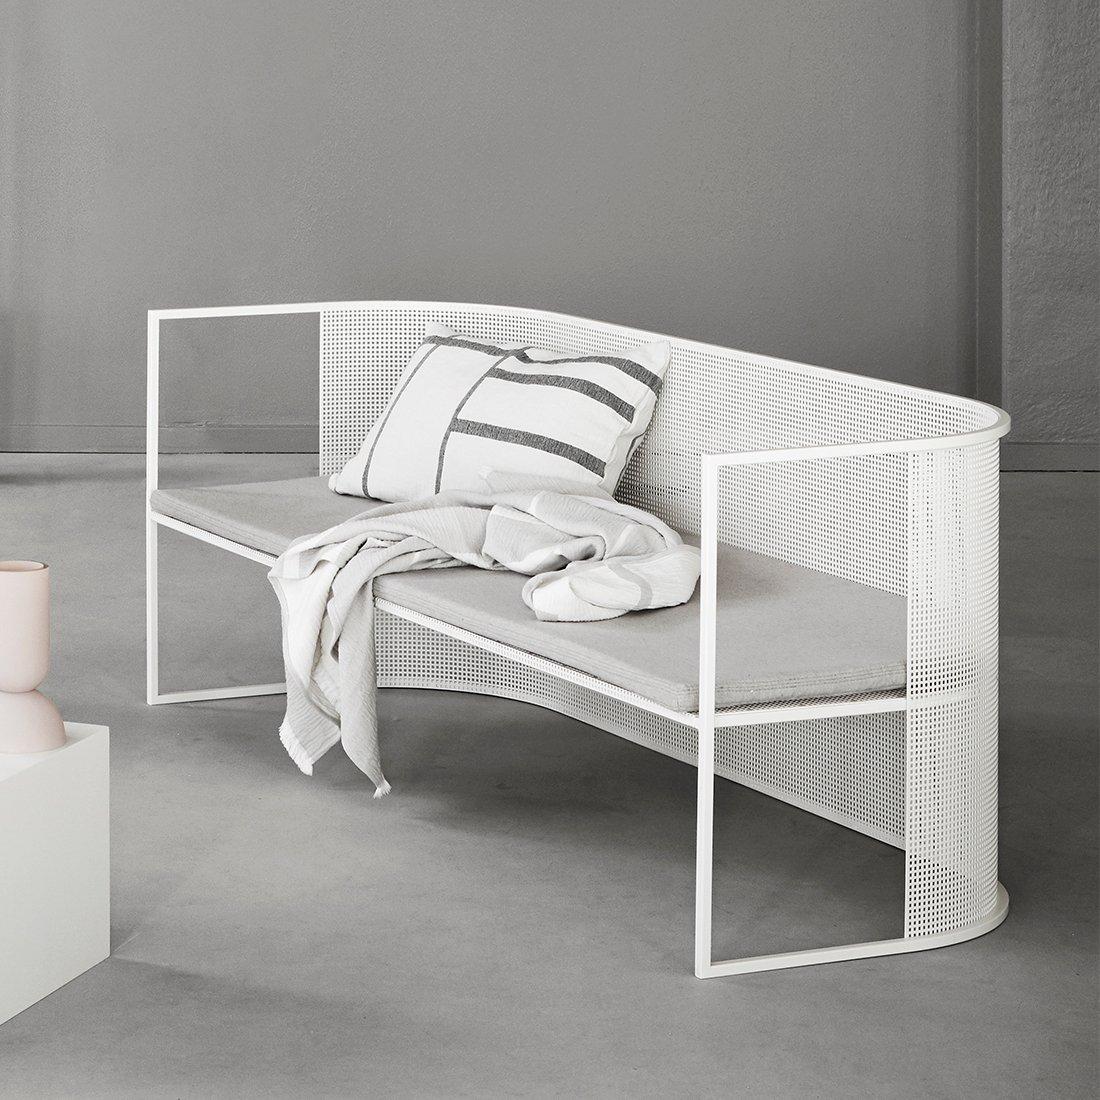 Biennale Interieur - Belgium's leading design and interior event - Kristinadamstudio_aw20_lifestyle-bauhaus_lounge_bench-beige-1_1100x.jpeg